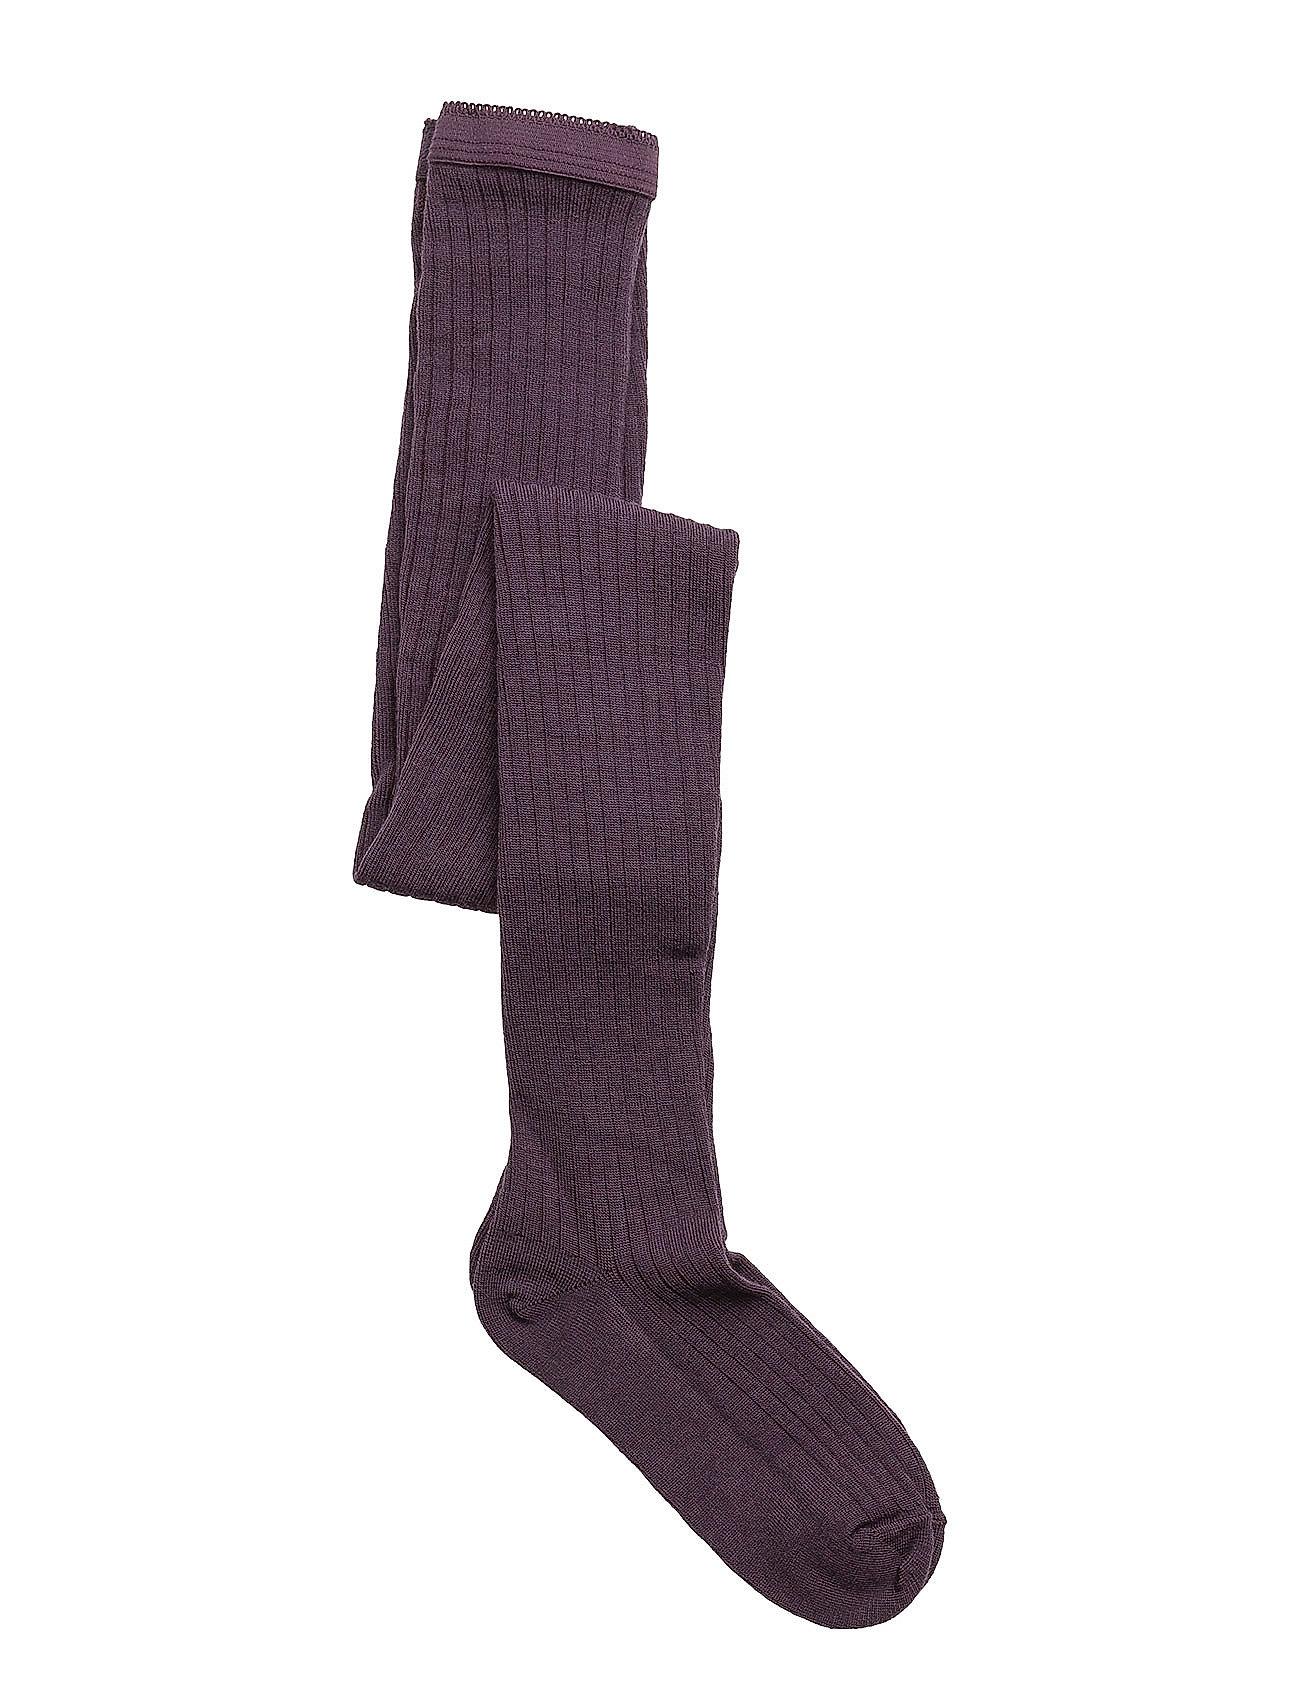 Tights 5/1 Pad Wool